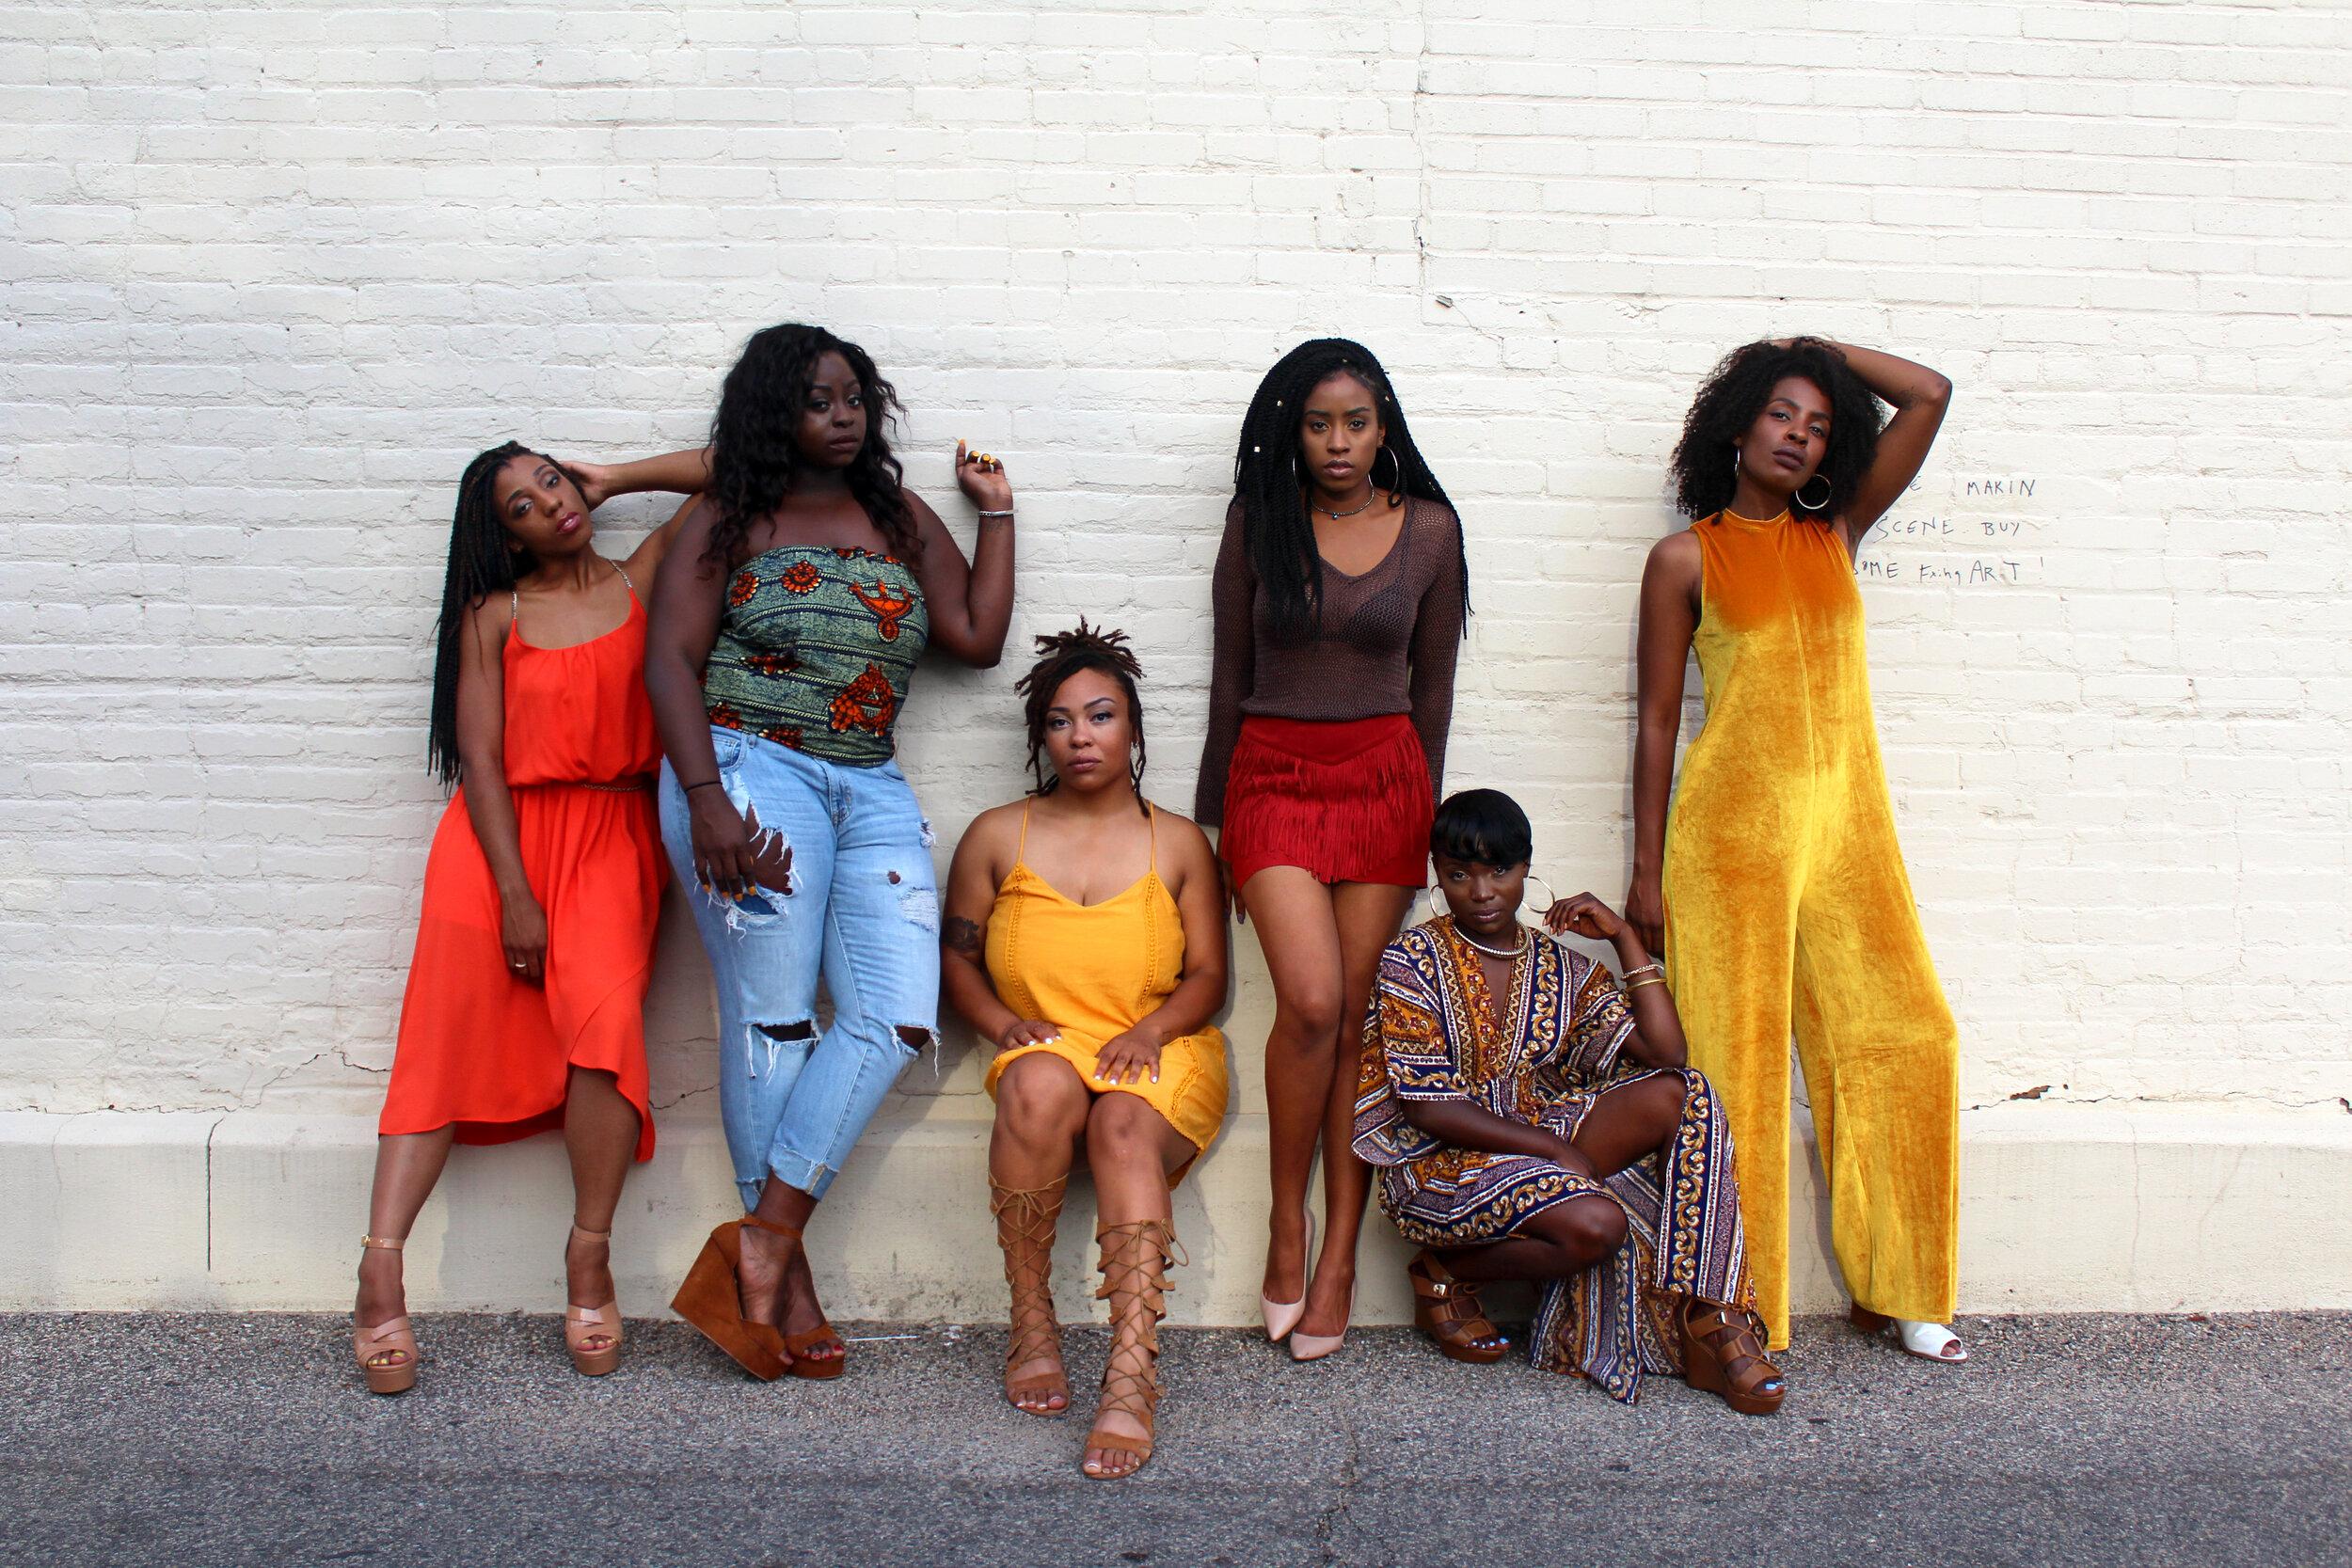 Curvy Runner Girl Squad